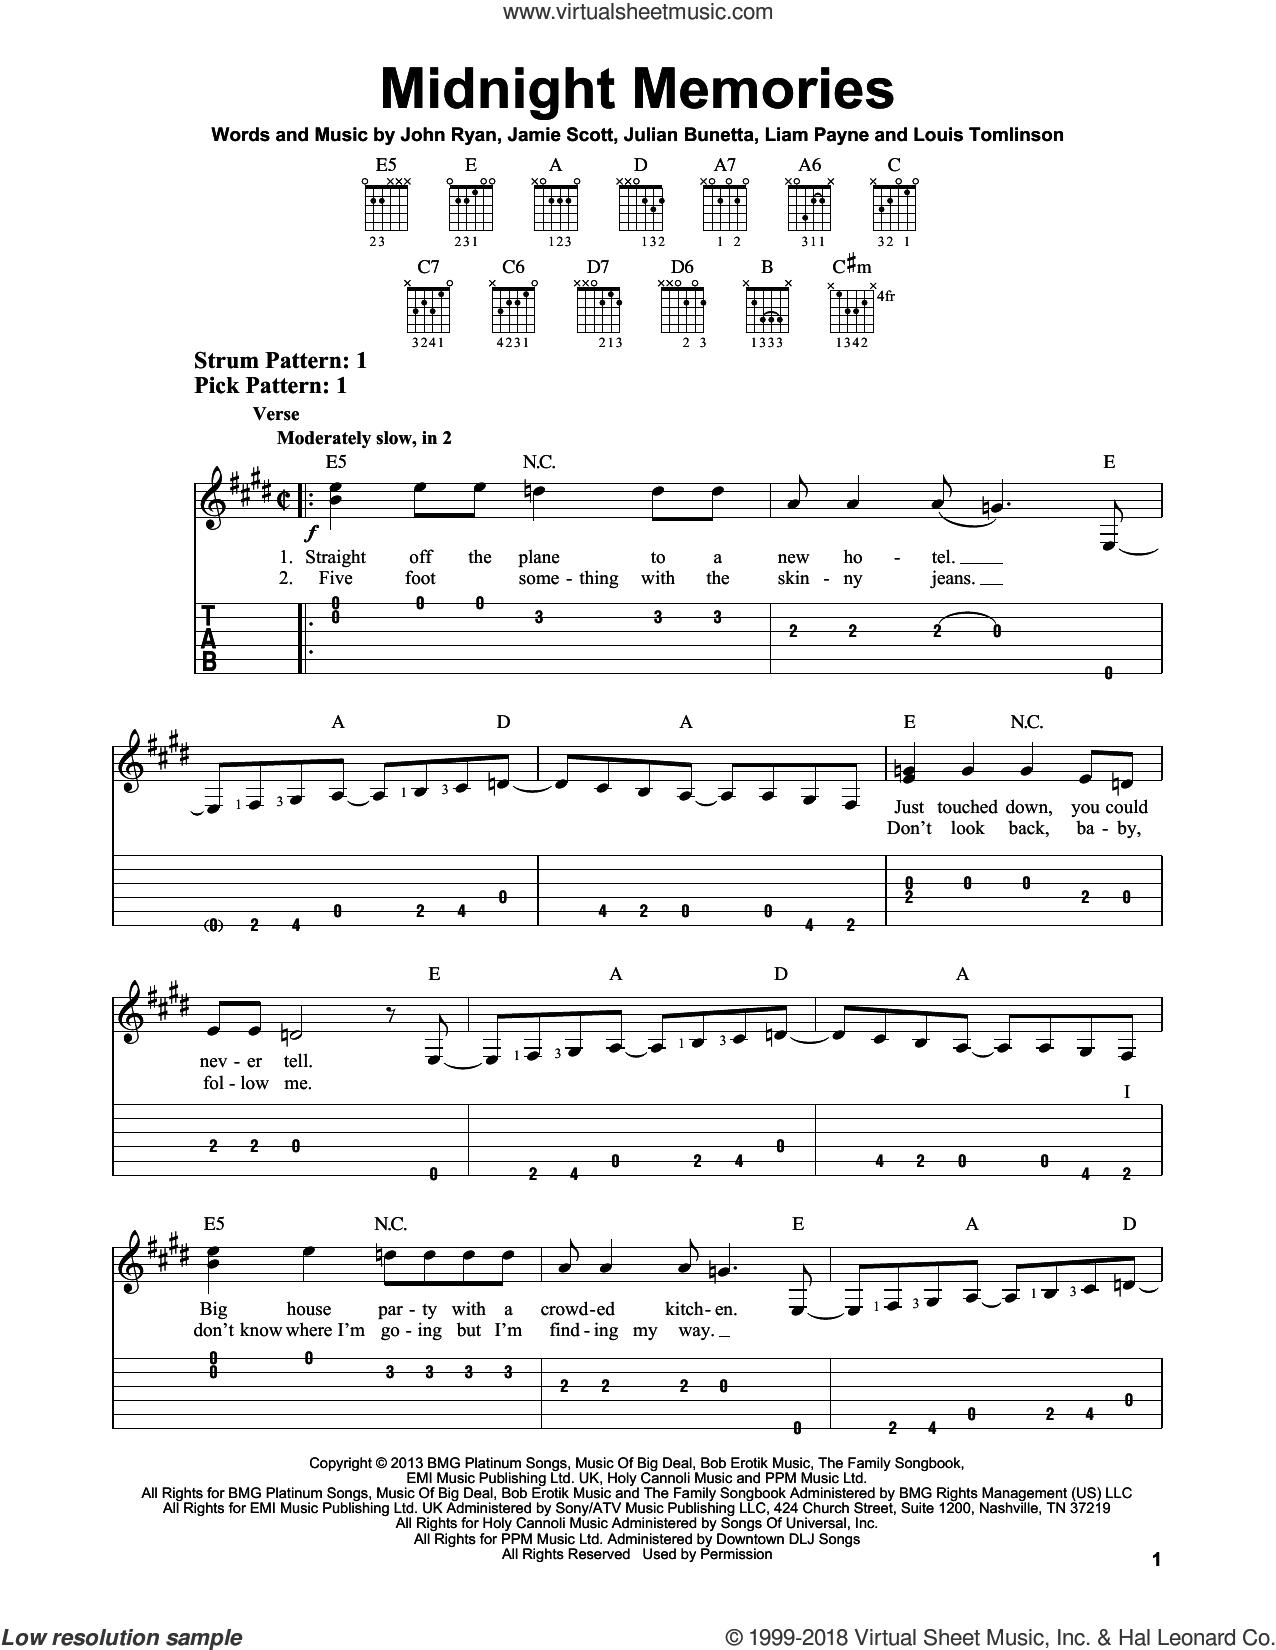 Midnight Memories sheet music for guitar solo (easy tablature) by One Direction, Jamie Scott, John Ryan, Julian Bunetta, Liam Payne and Louis Tomlinson, easy guitar (easy tablature)